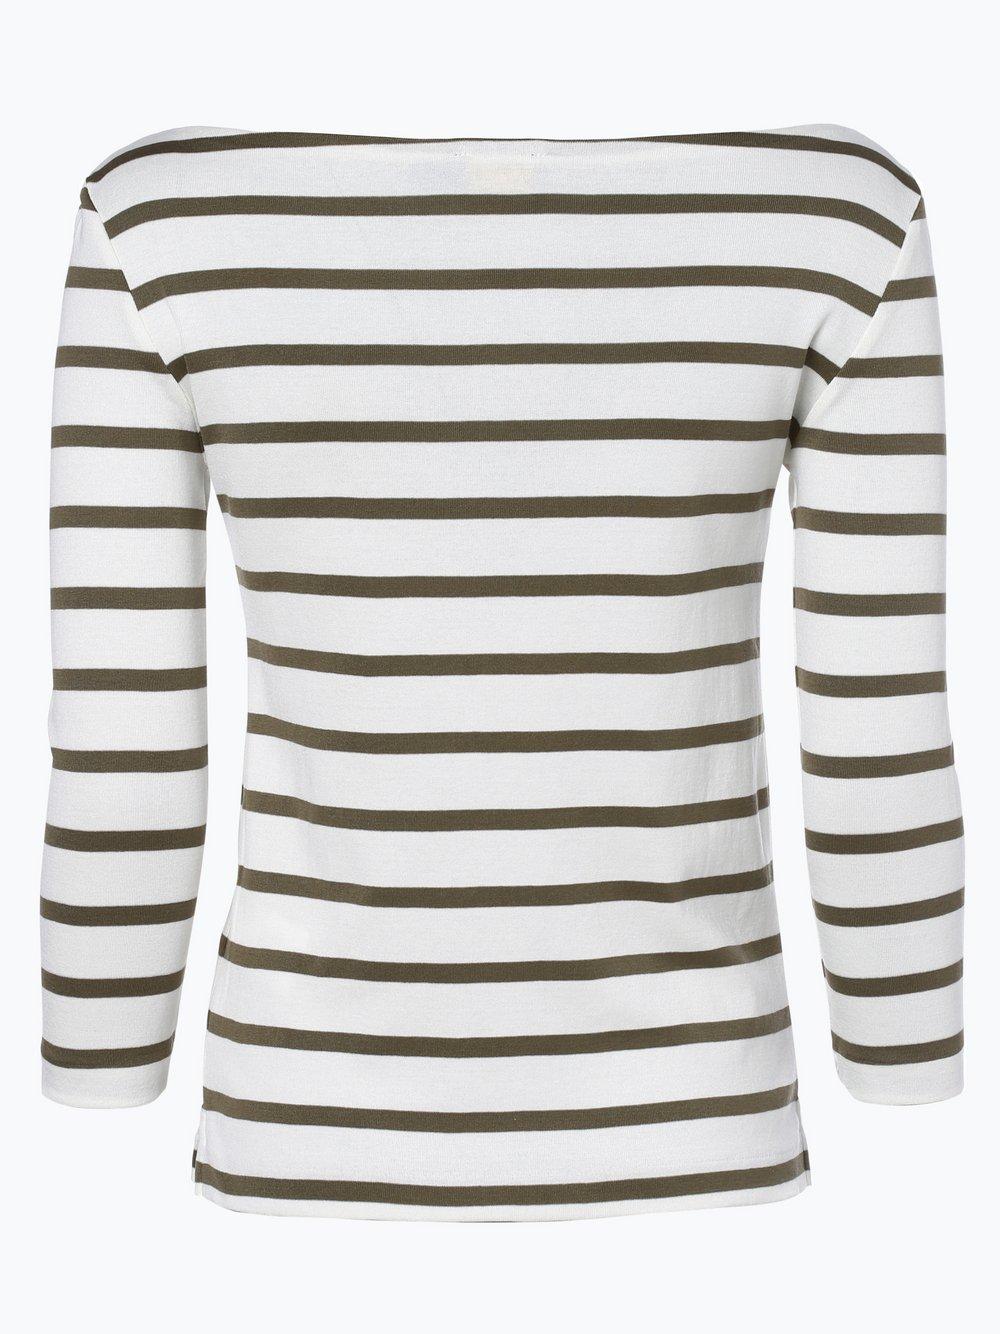 reputable site 2bc76 4d123 Polo Ralph Lauren Damen Langarmshirt online kaufen ...